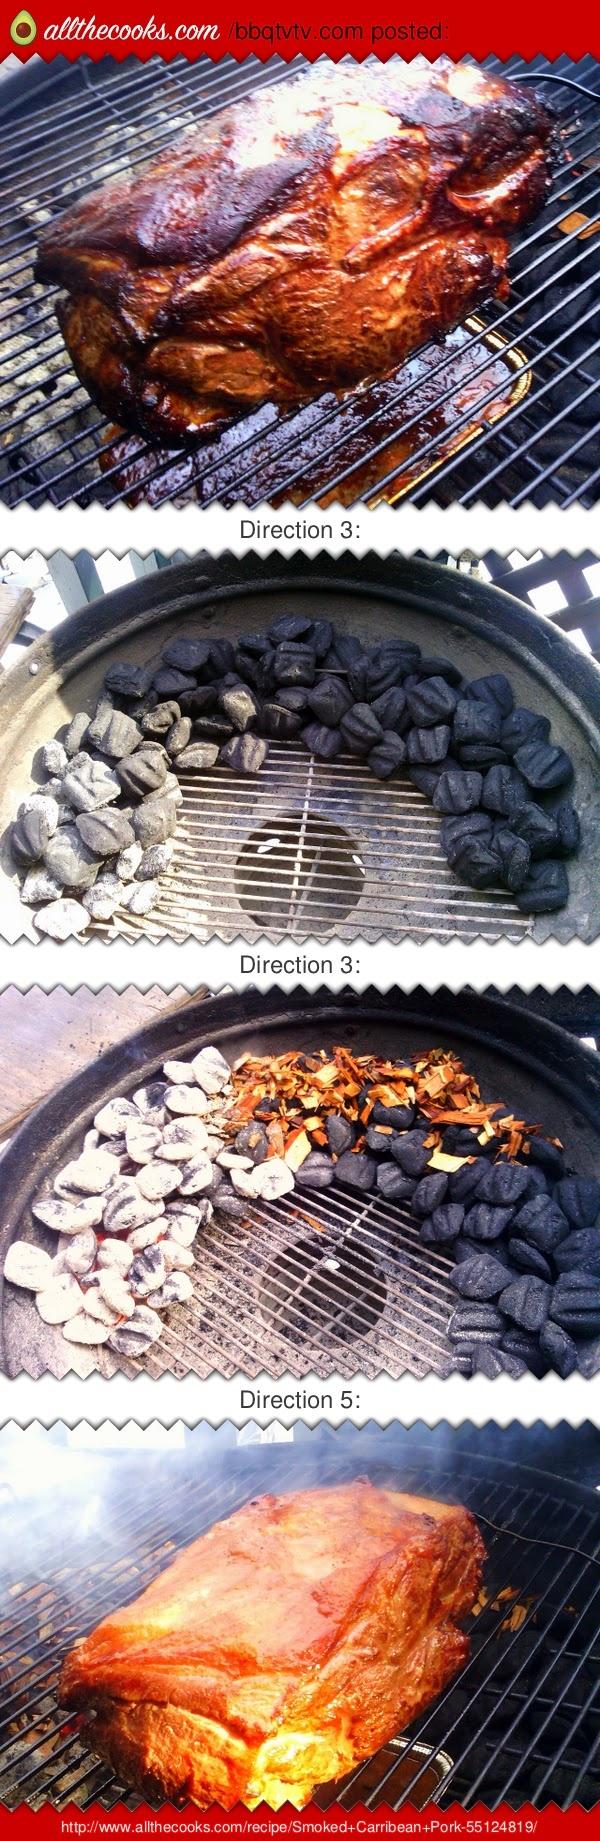 Smoked Carribean Pork